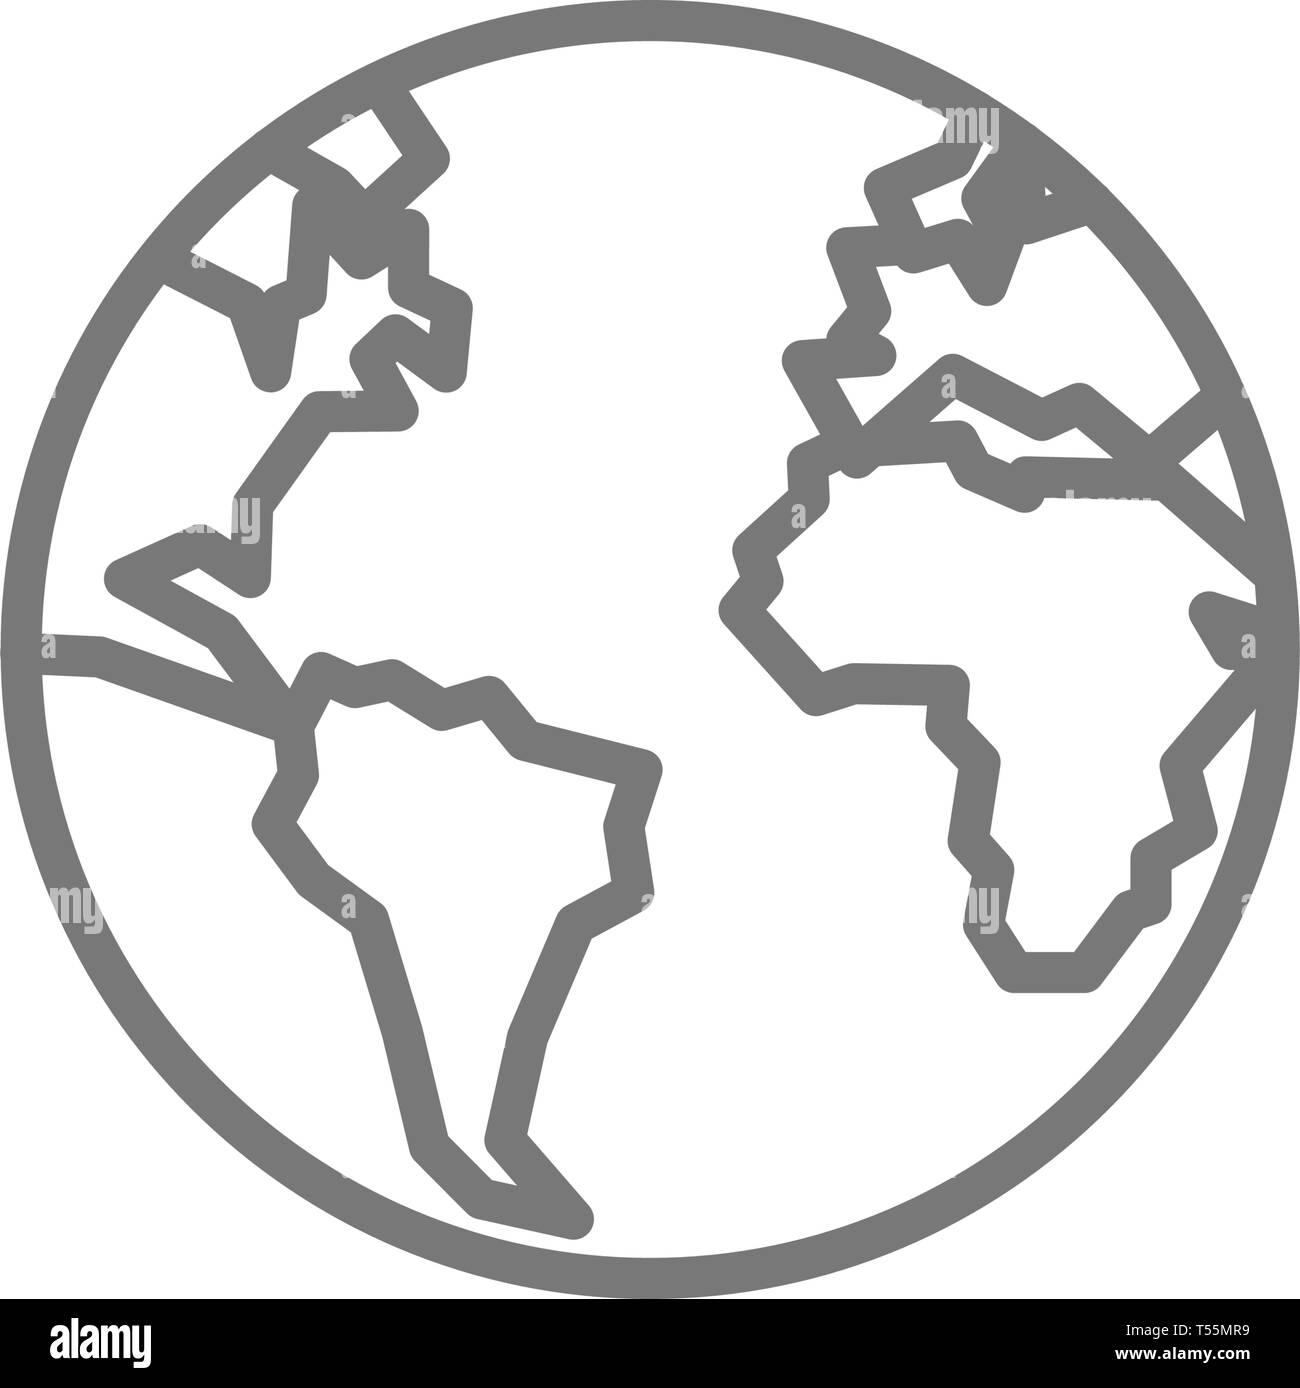 Earth, globe, planet line icon. - Stock Image